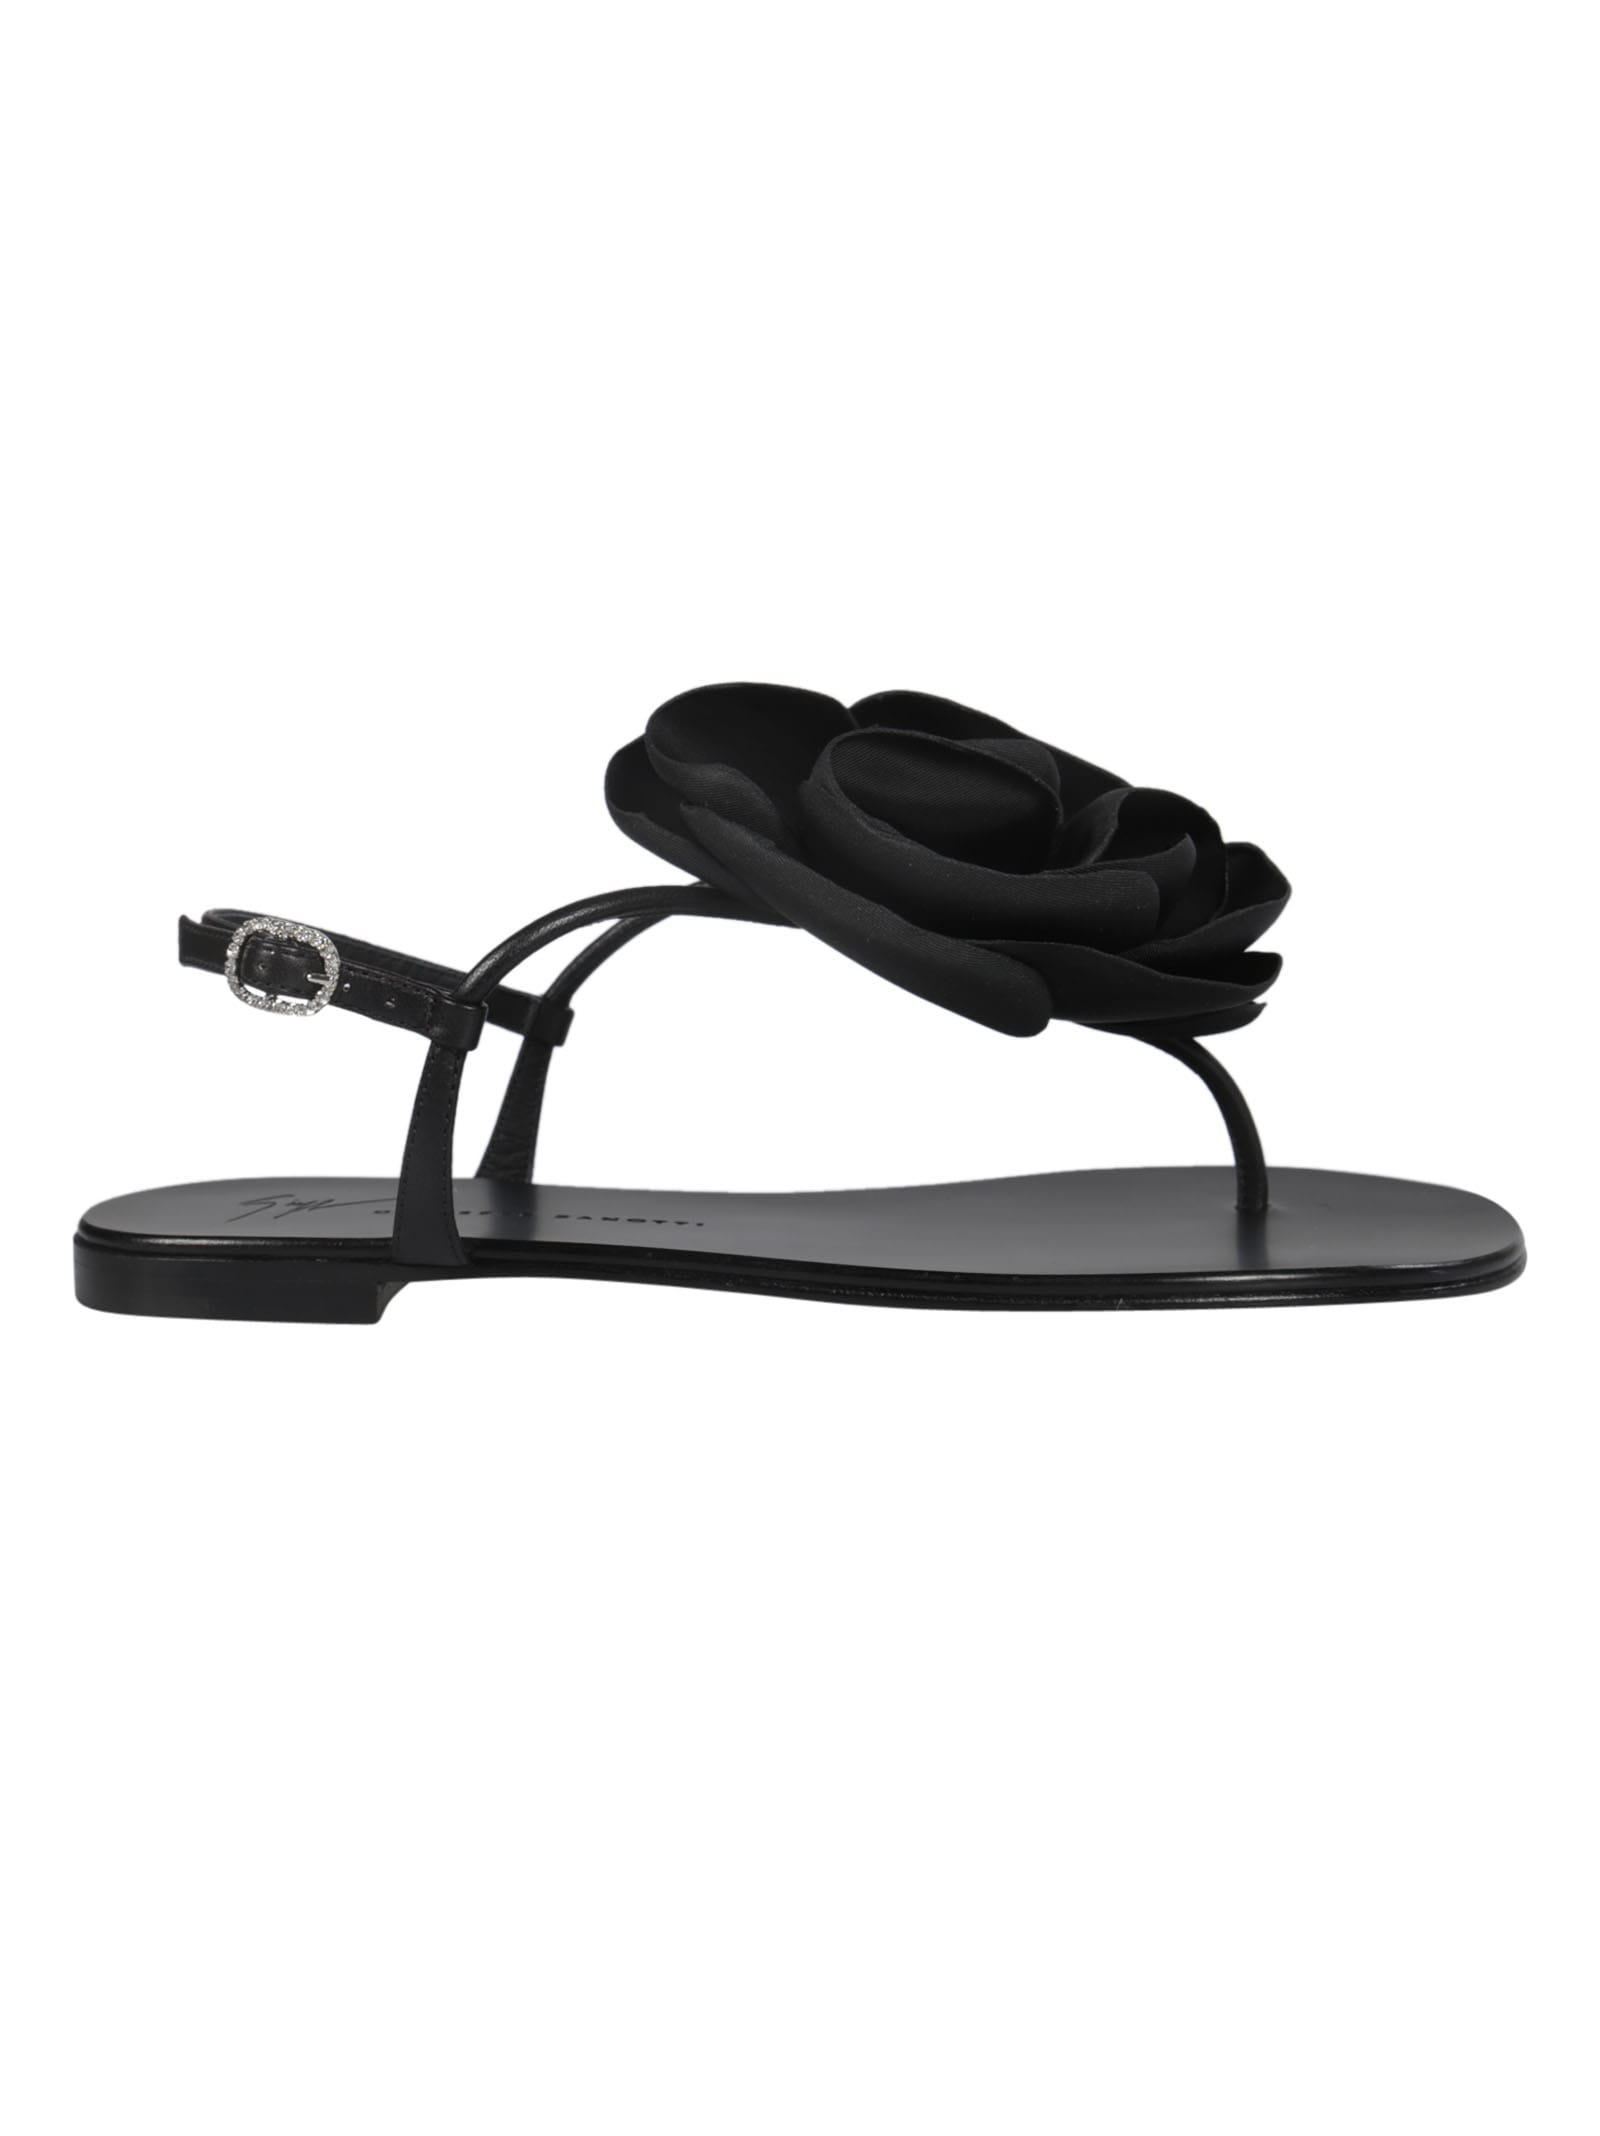 47b2e43288c09 Giuseppe Zanotti Giuseppe Zanotti Flower Embellished Flat Sandals ...